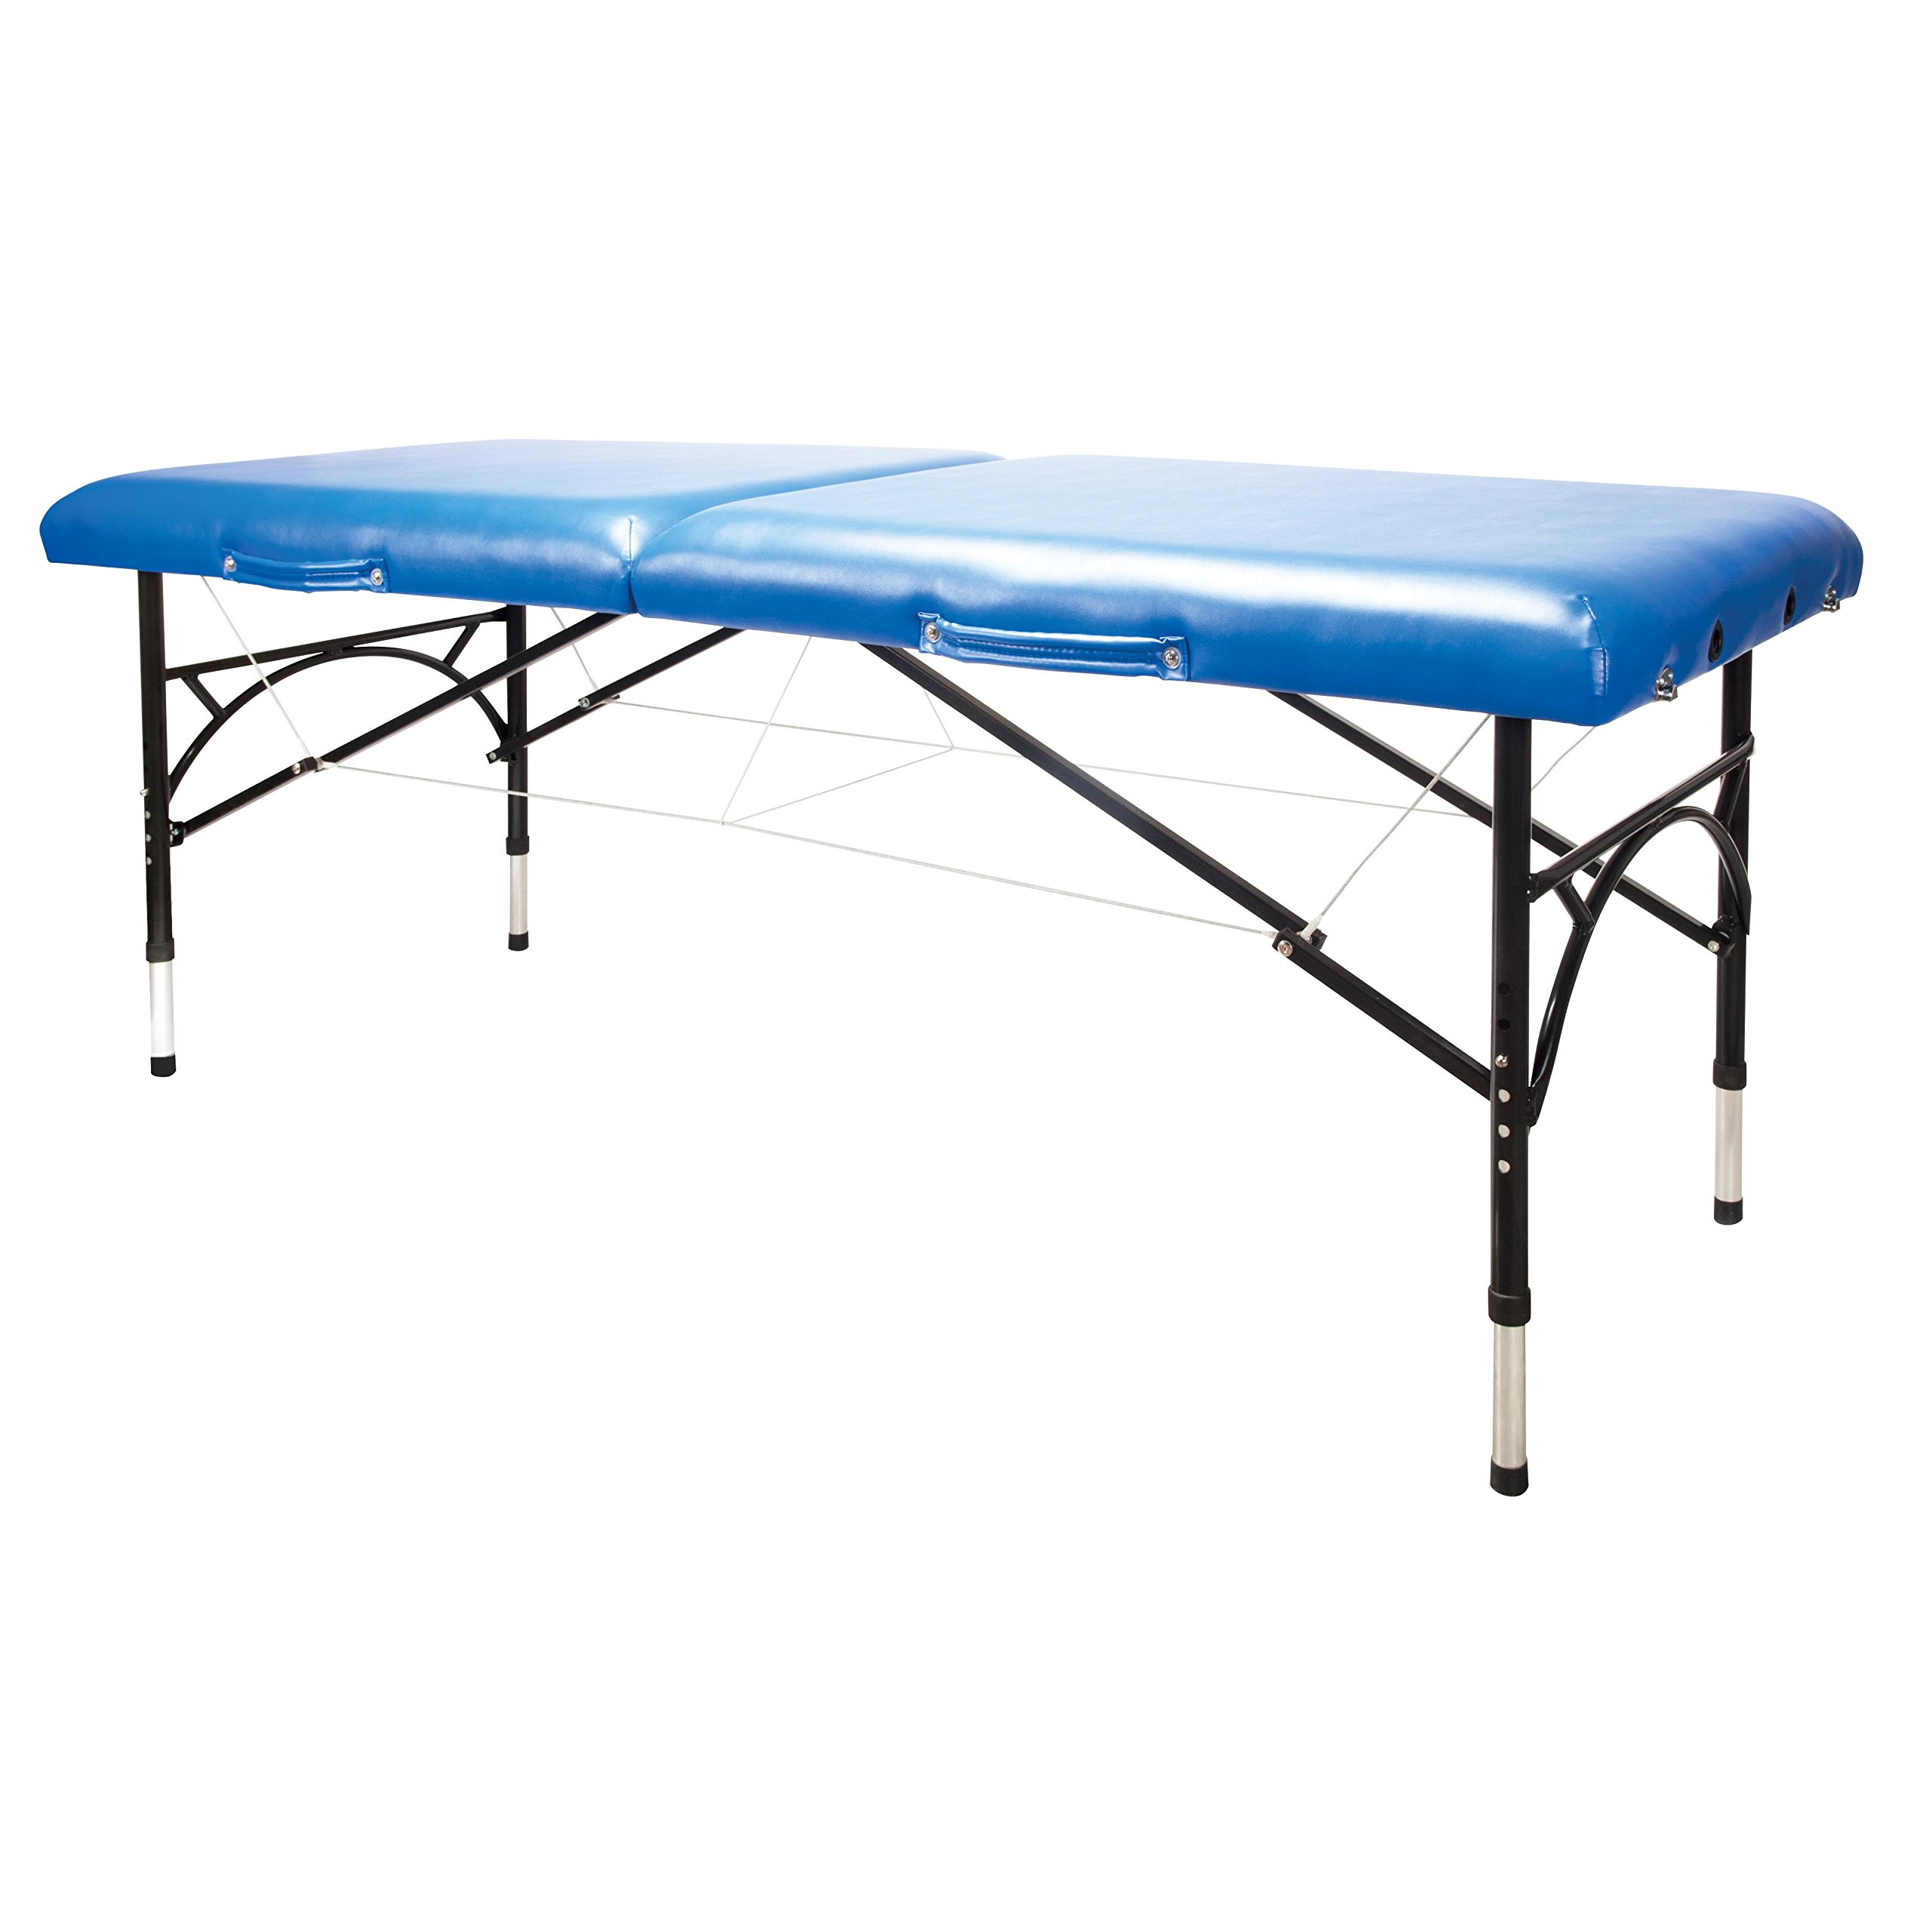 3B Scientific W60610MB Aluminum Portable Table, Blue